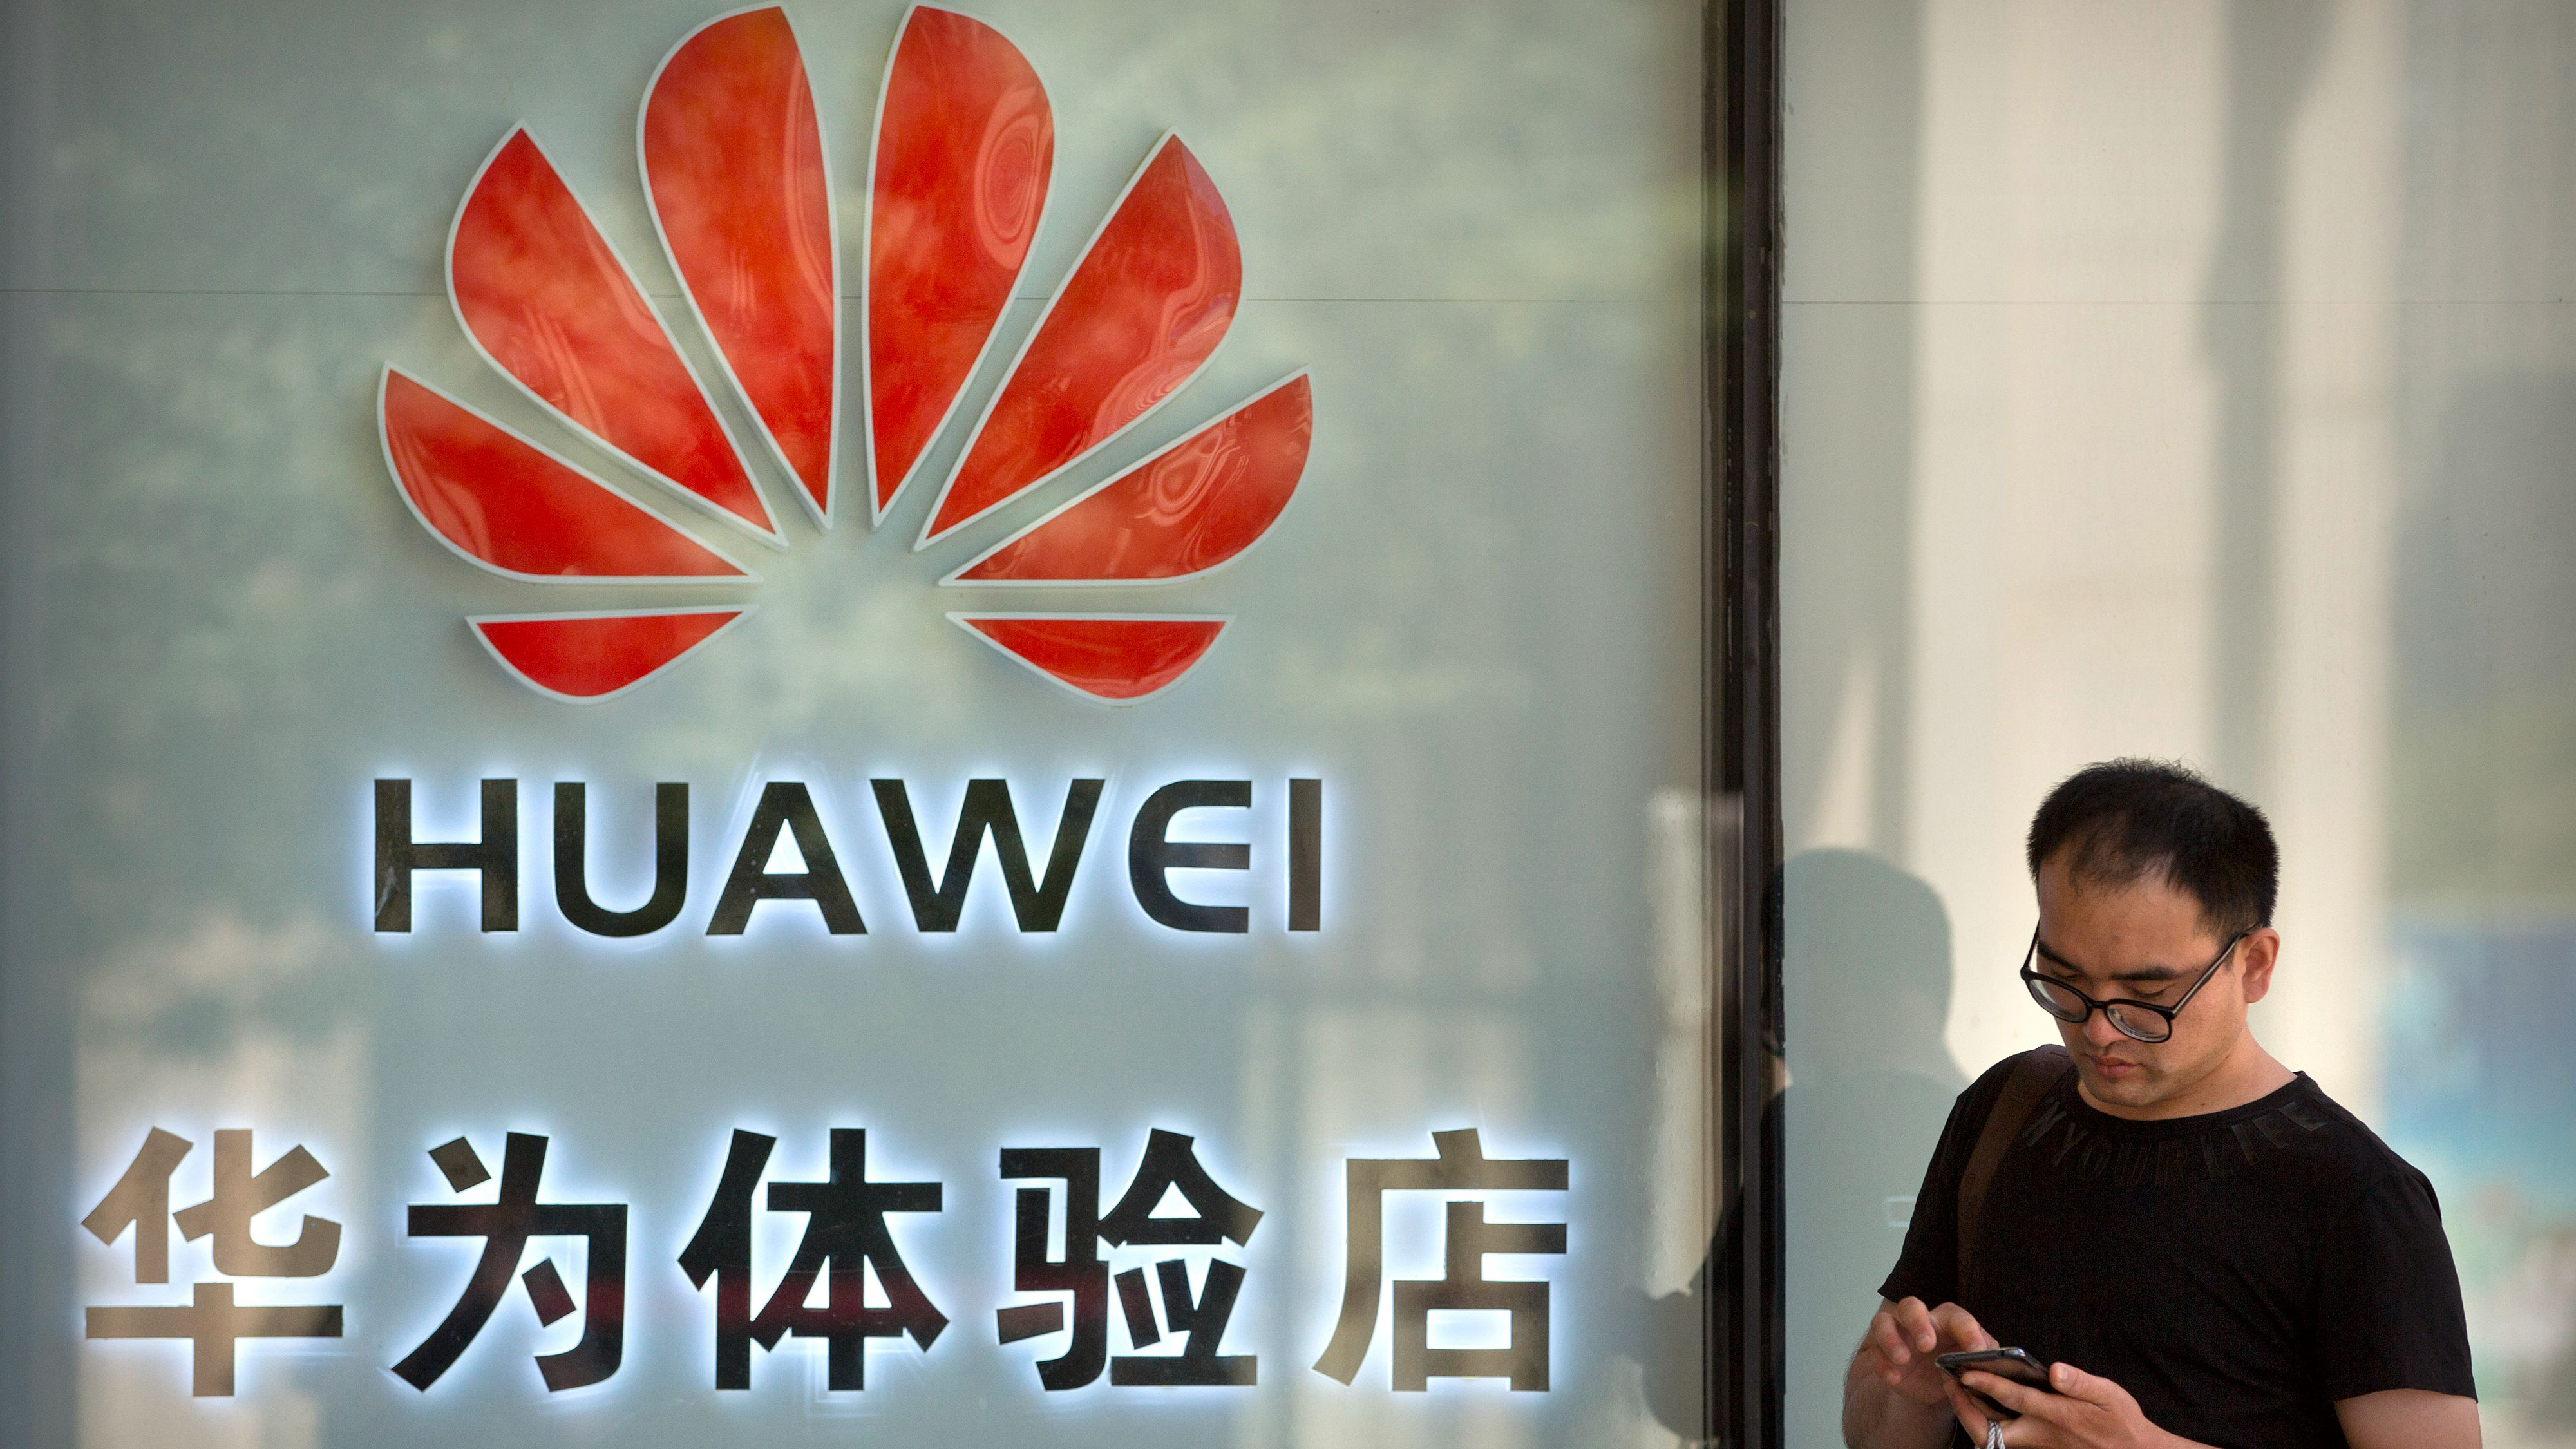 NY Times: Trump letter på forbudet mot Huawei